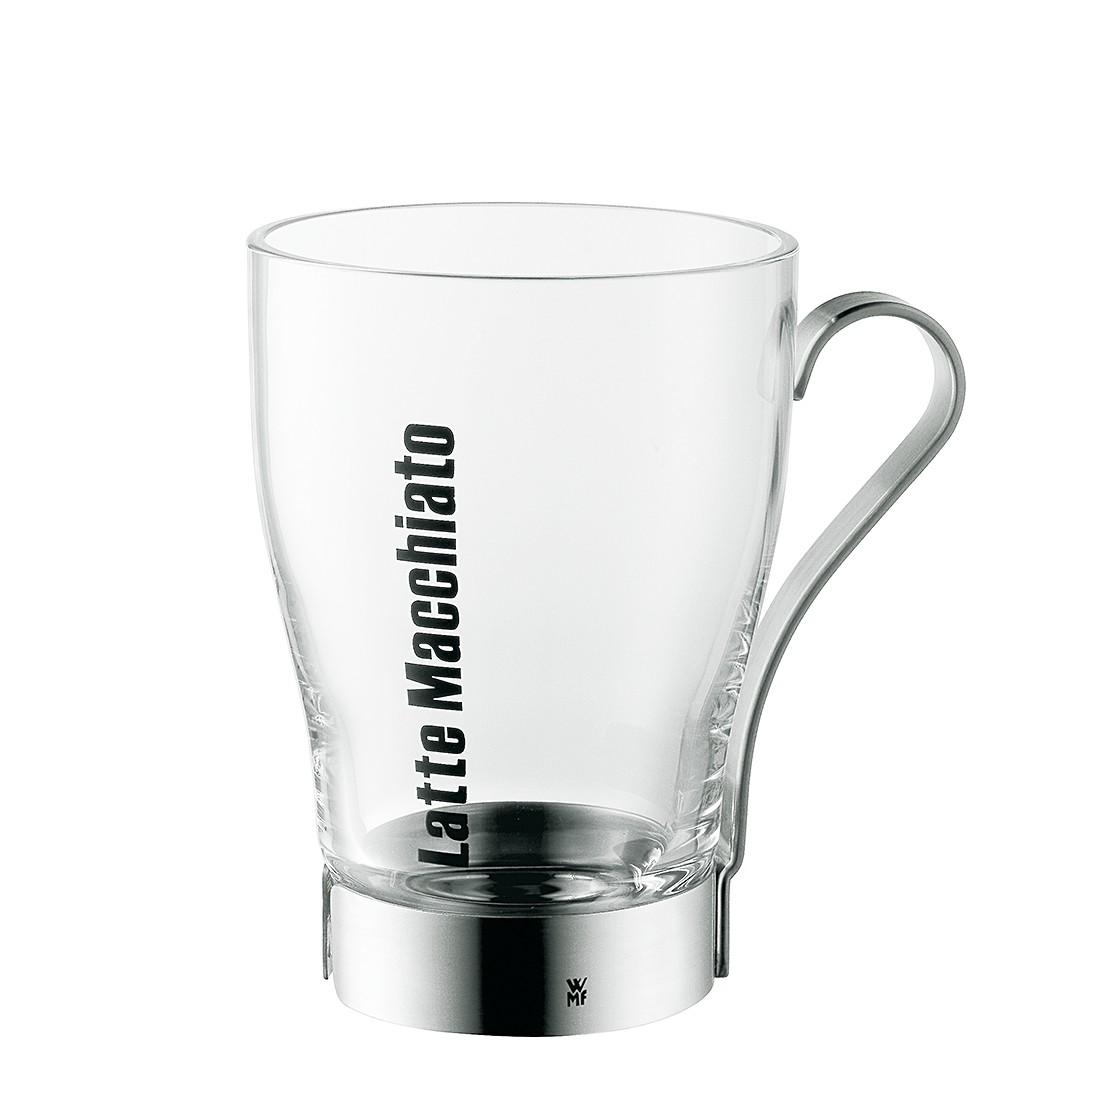 wmf latte macciato glas preisvergleich preis ab 15 95 geschirr. Black Bedroom Furniture Sets. Home Design Ideas